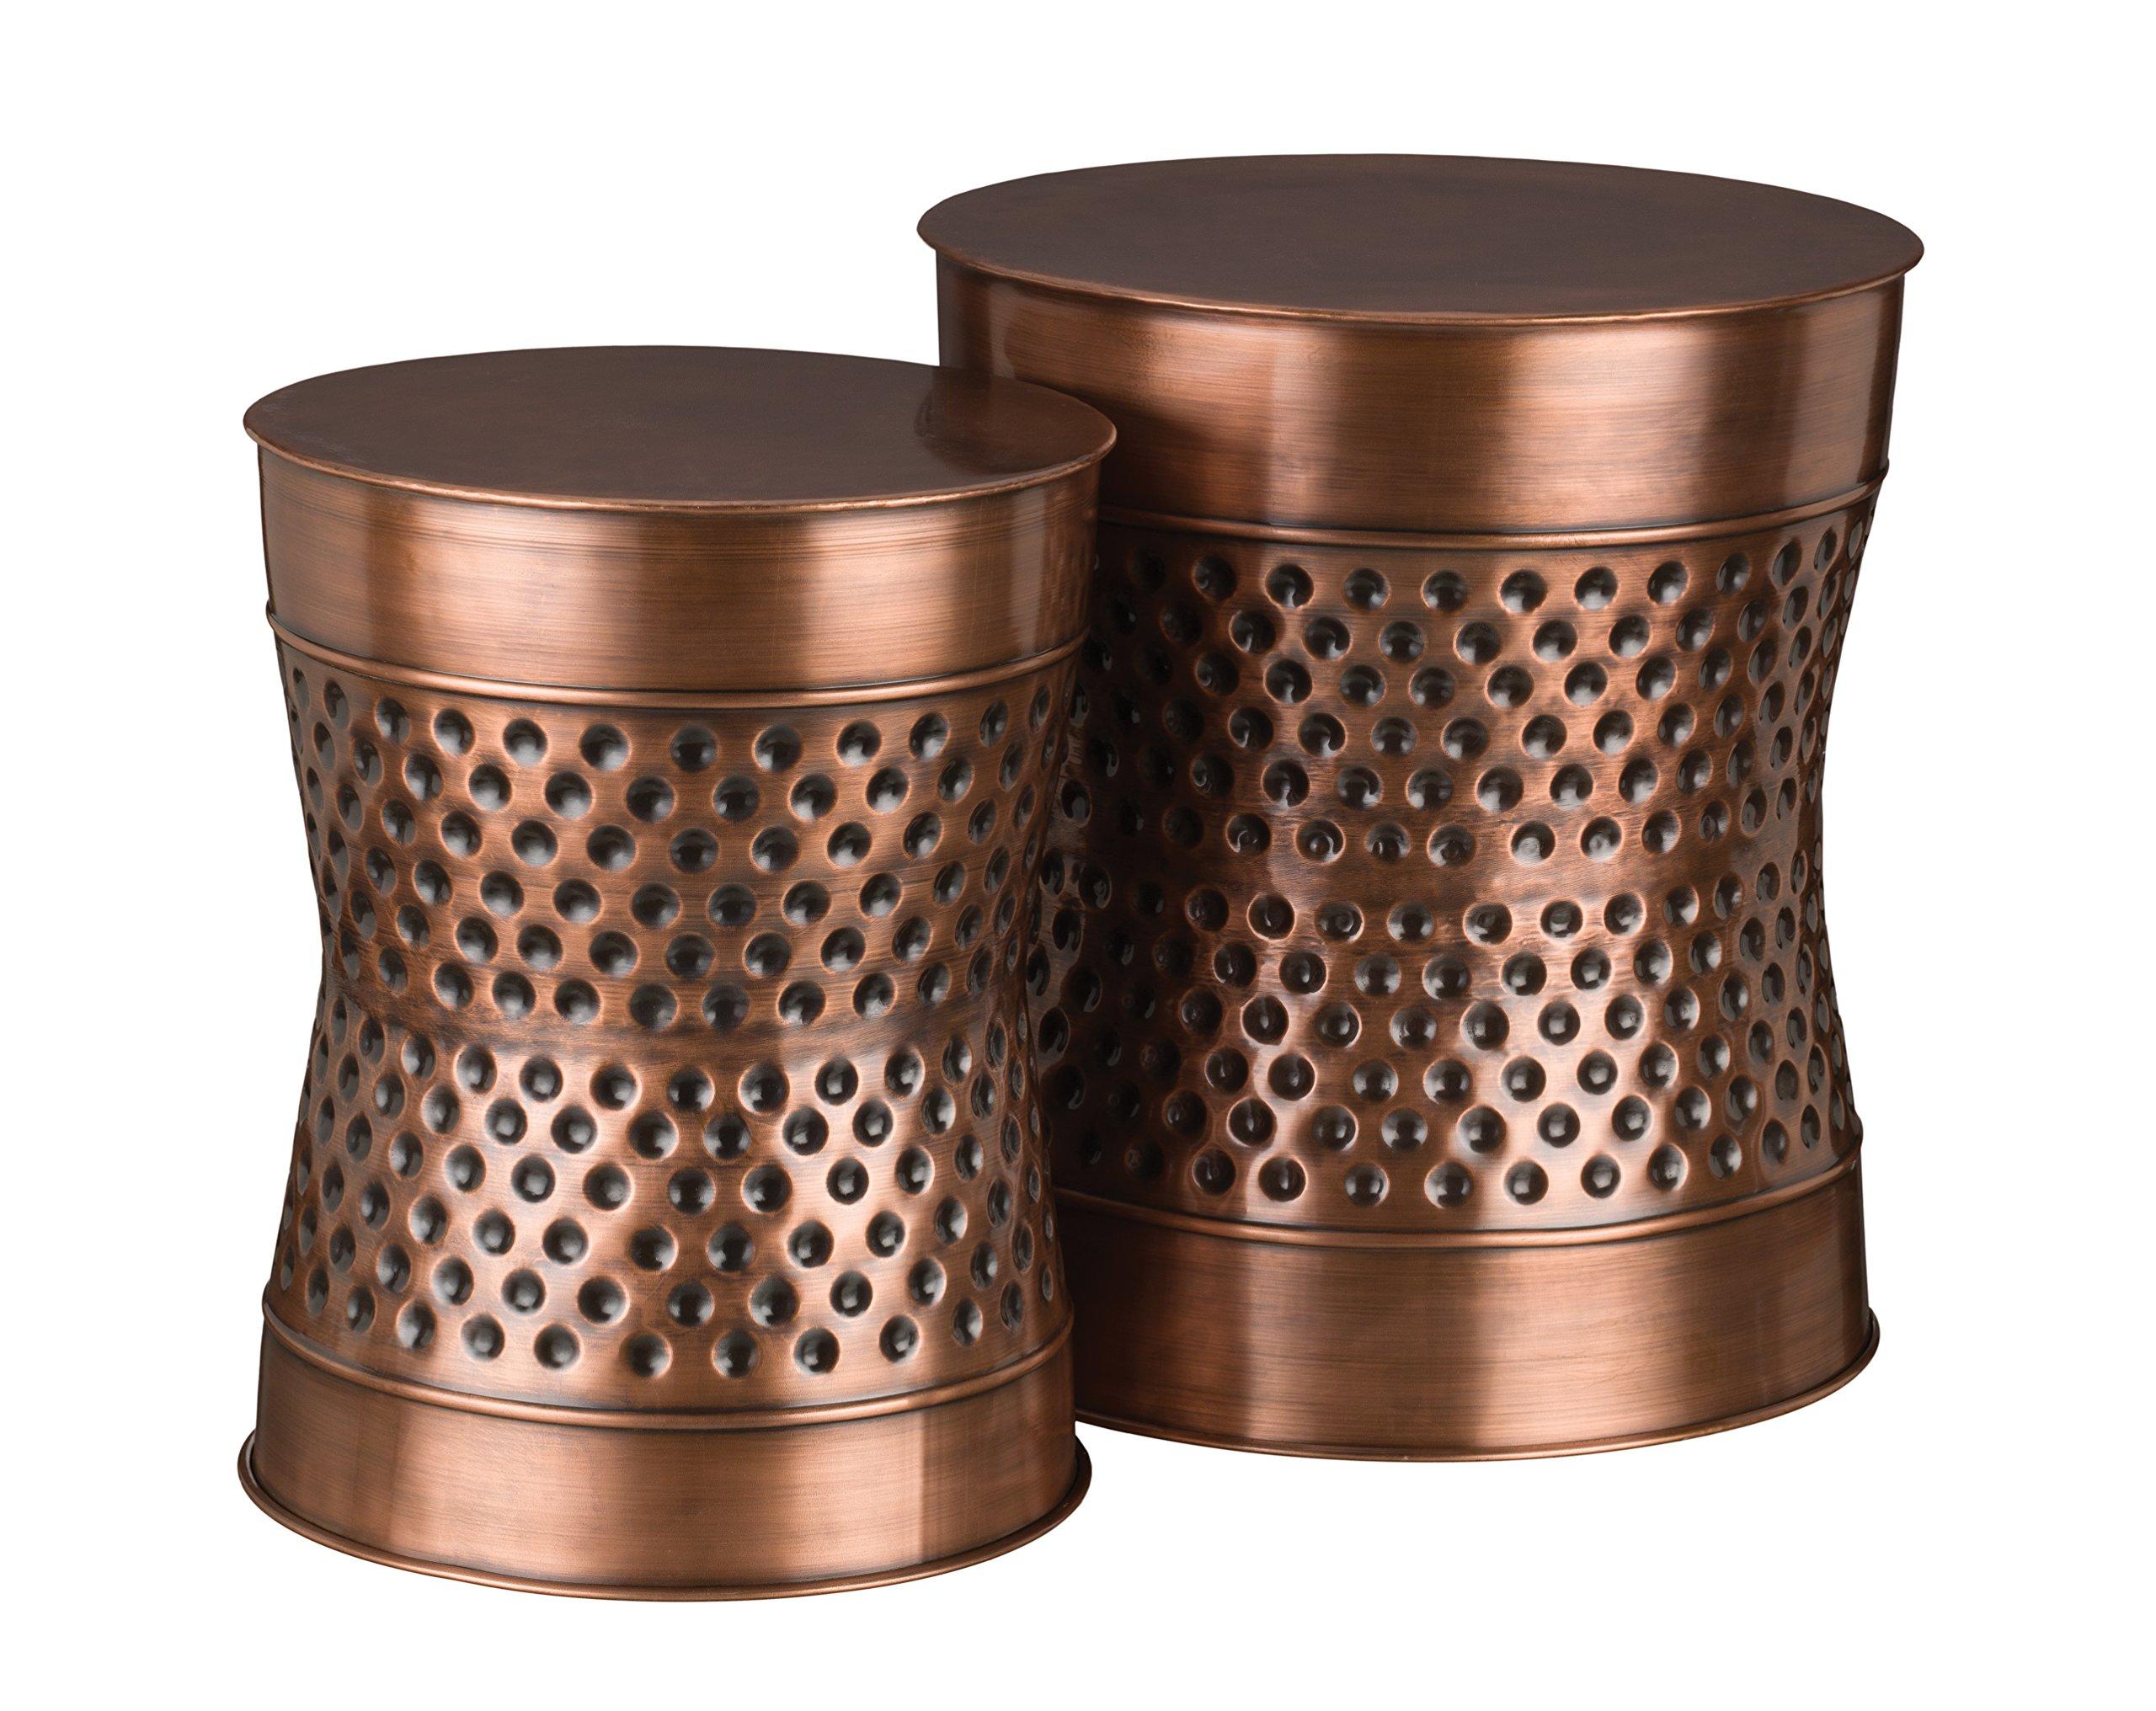 Regal Art & Gift Dotted Garden Stool (Set of 2), Copper